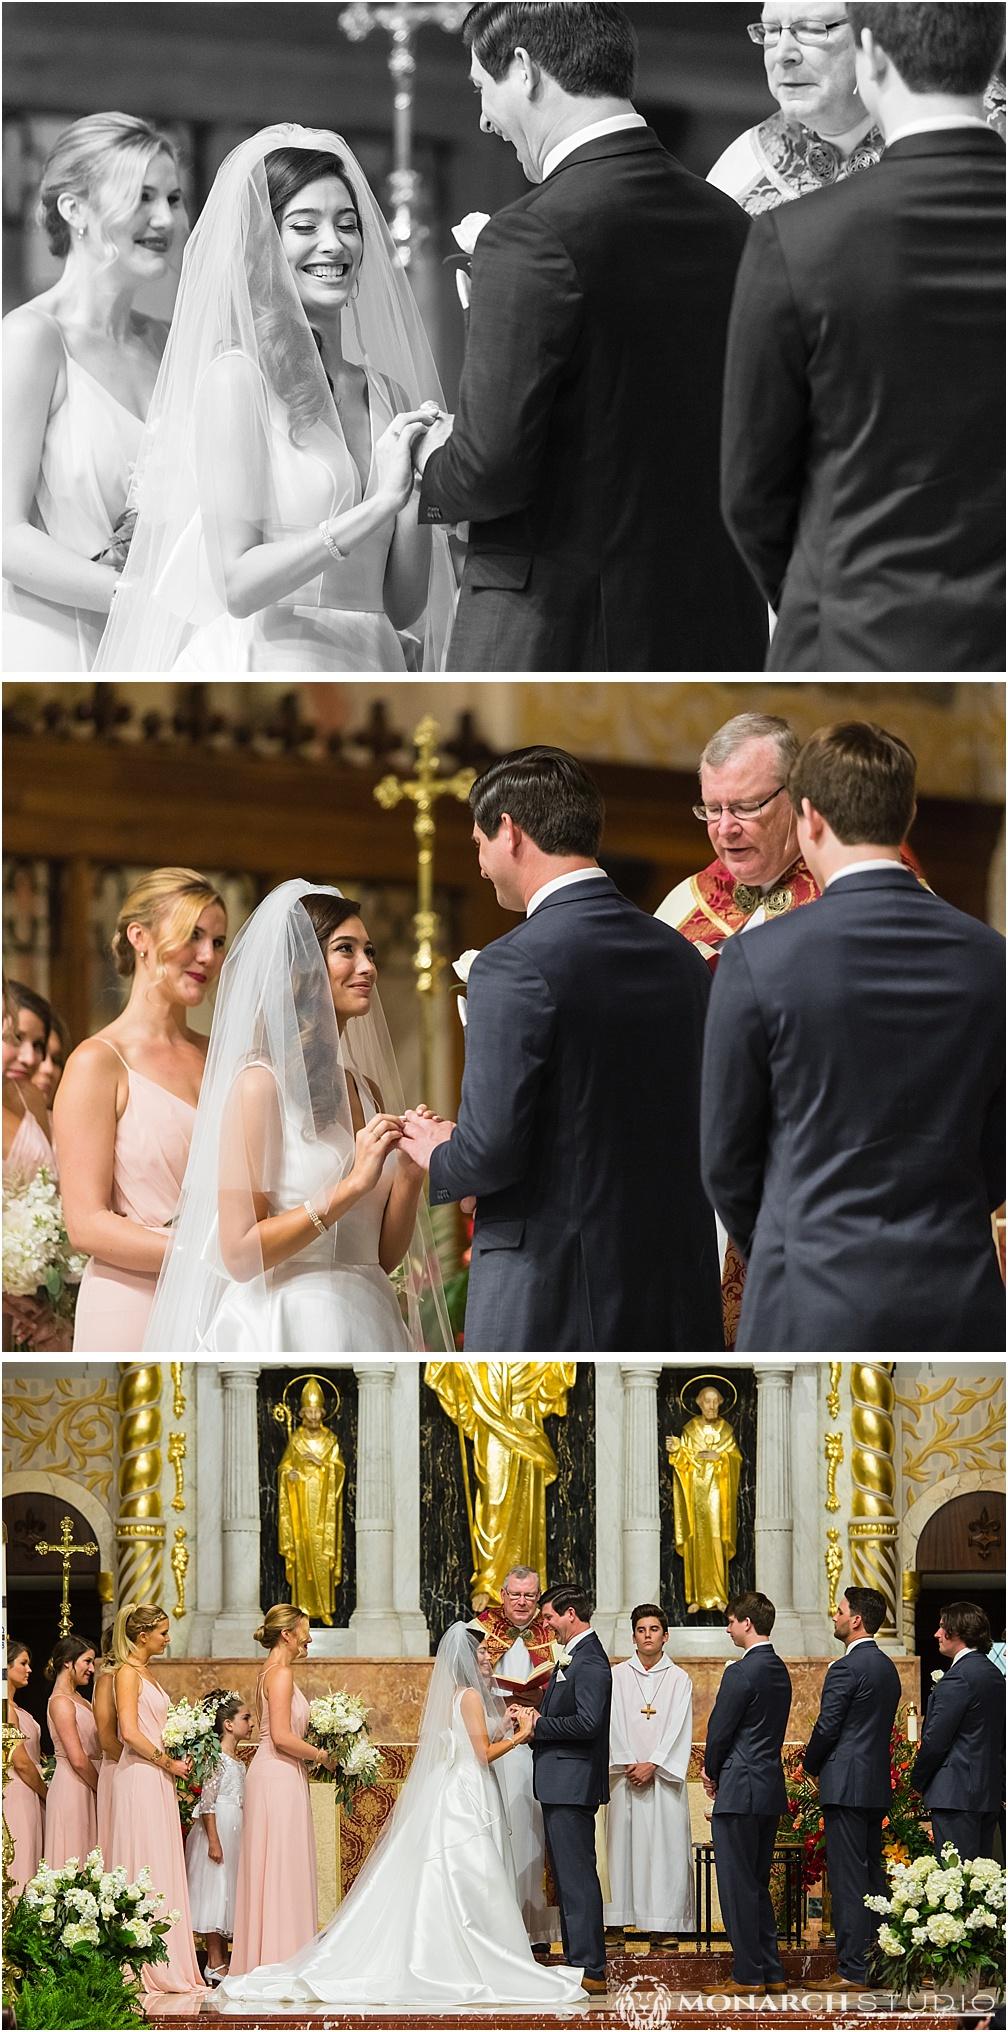 st-augustine-wedding-photographer-069.jpg